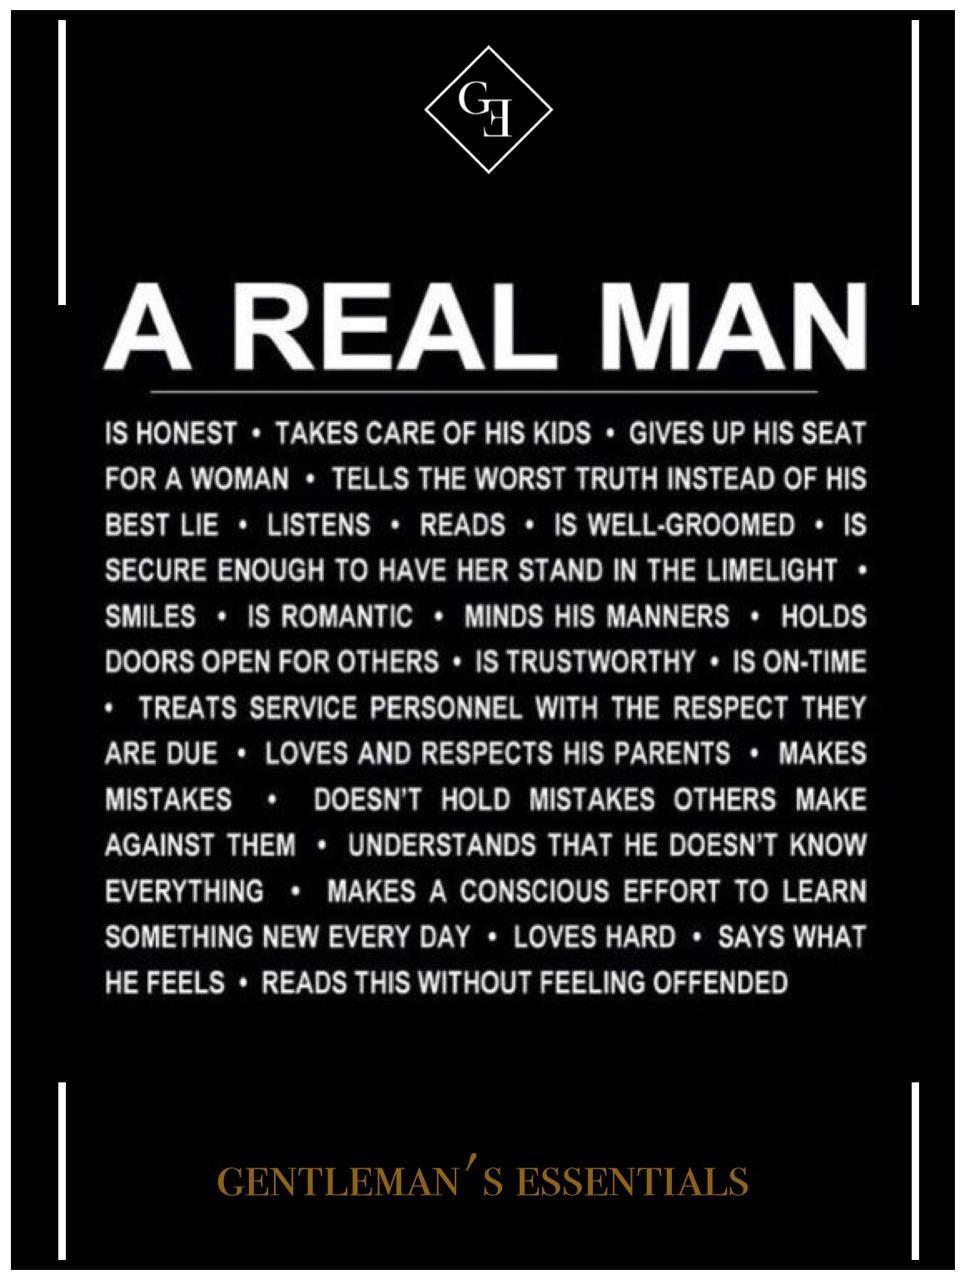 Daily Quote Gentlemans Essentials Men Pinterest Real Man